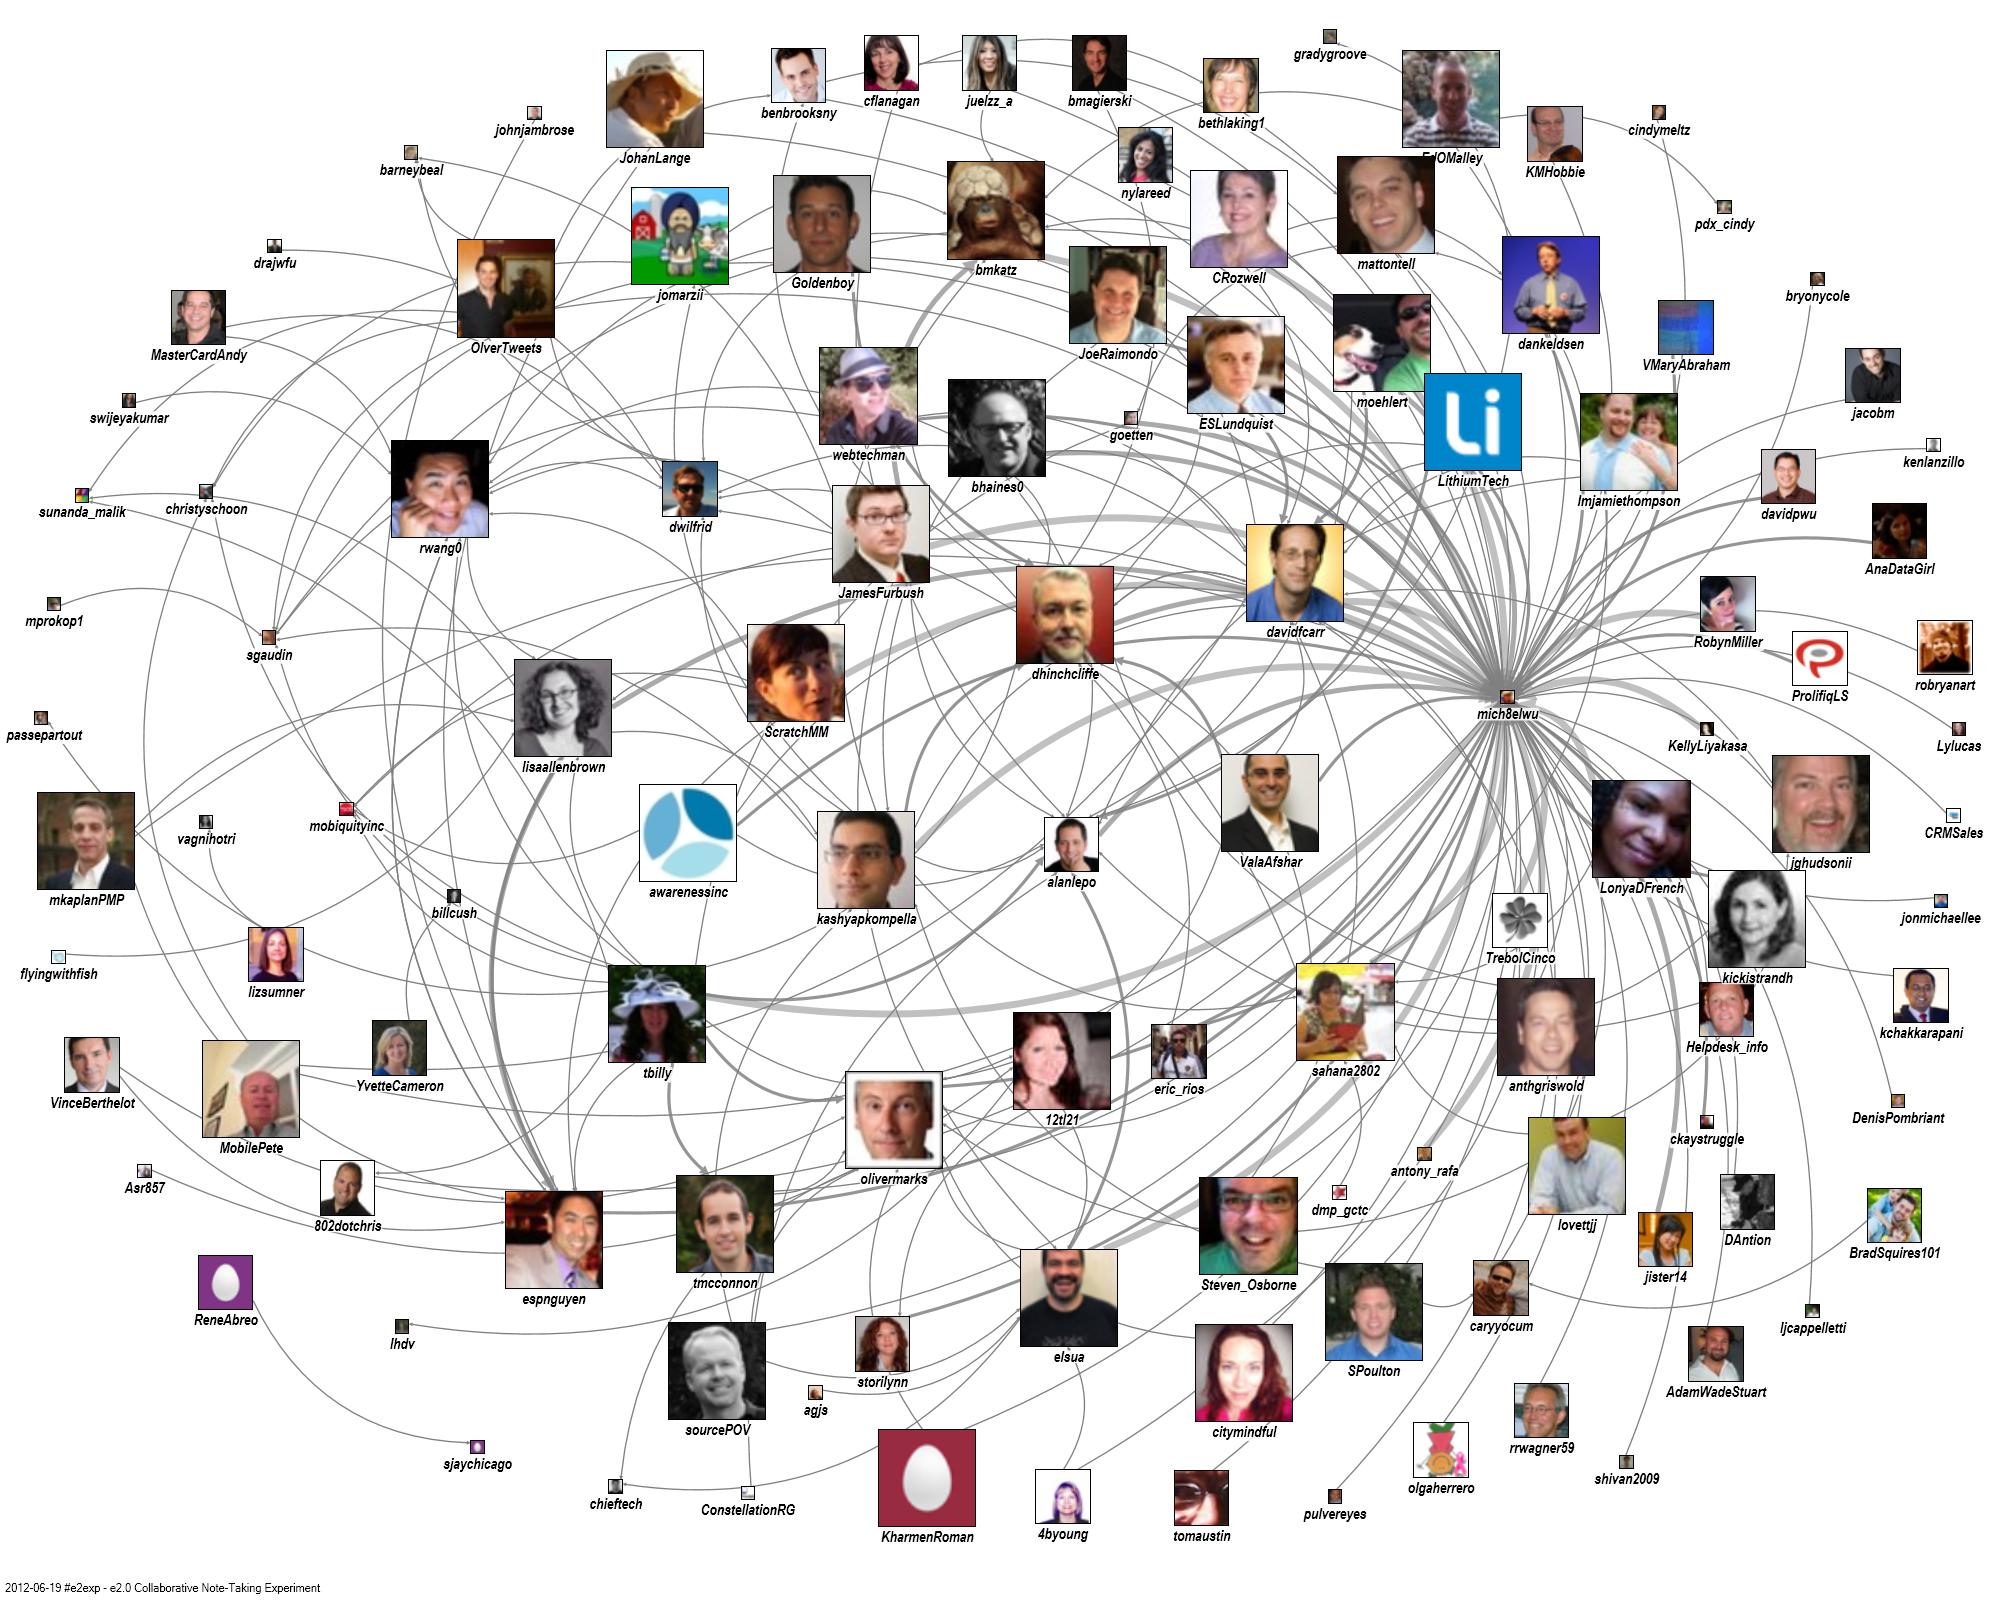 e2conf e2exp CollaborationGraph OutDeg.png